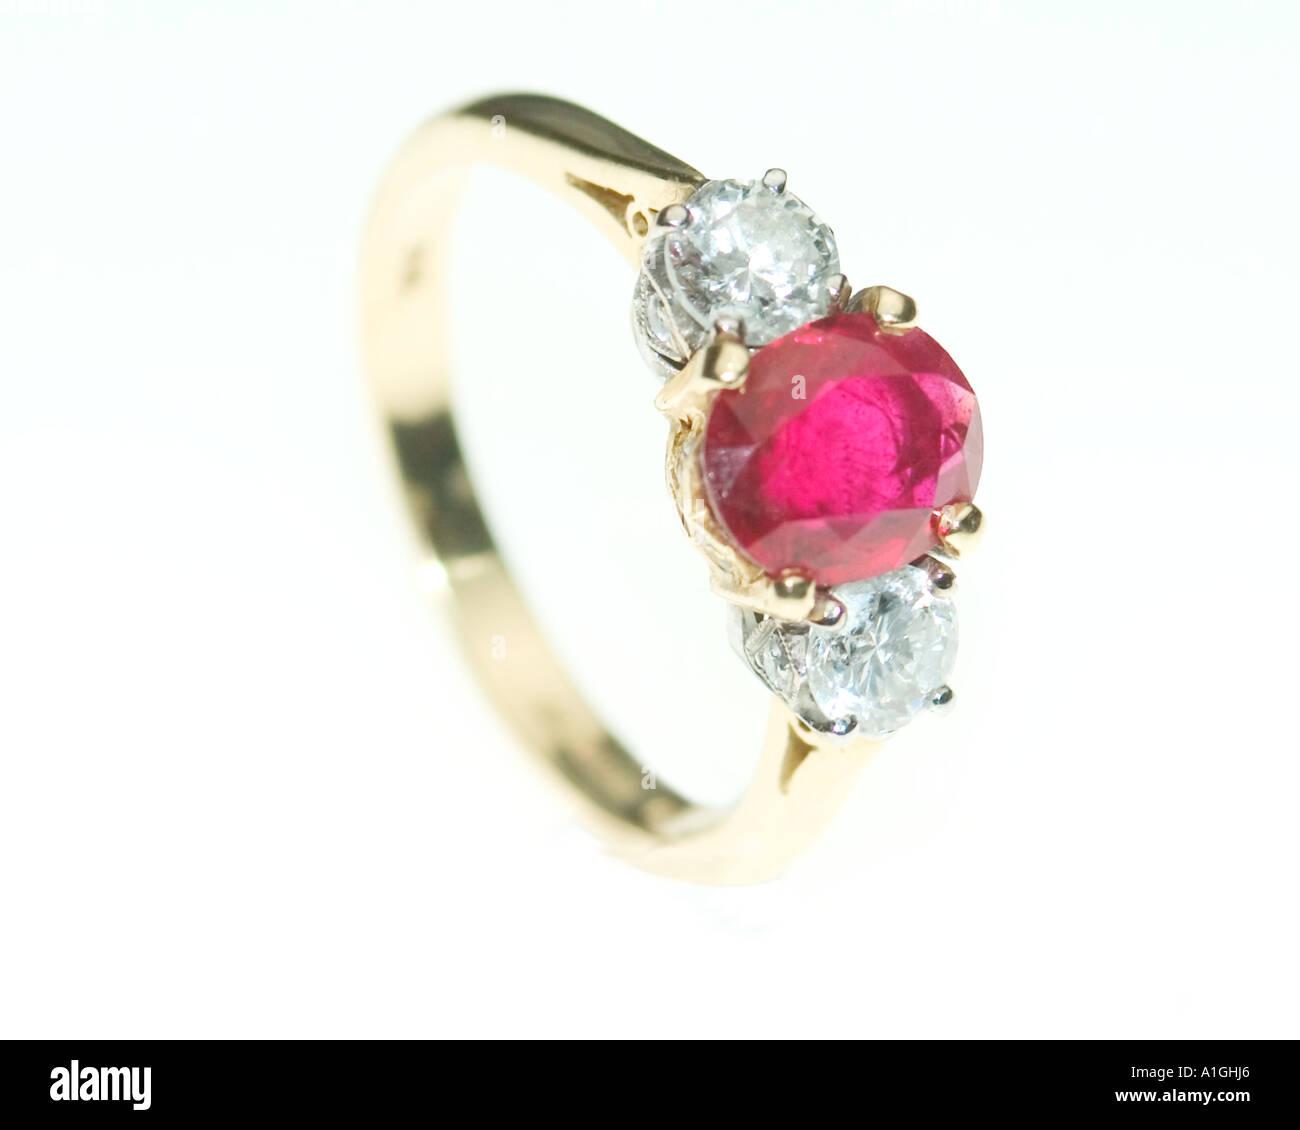 ruby and diamond wedding ring - Stock Image